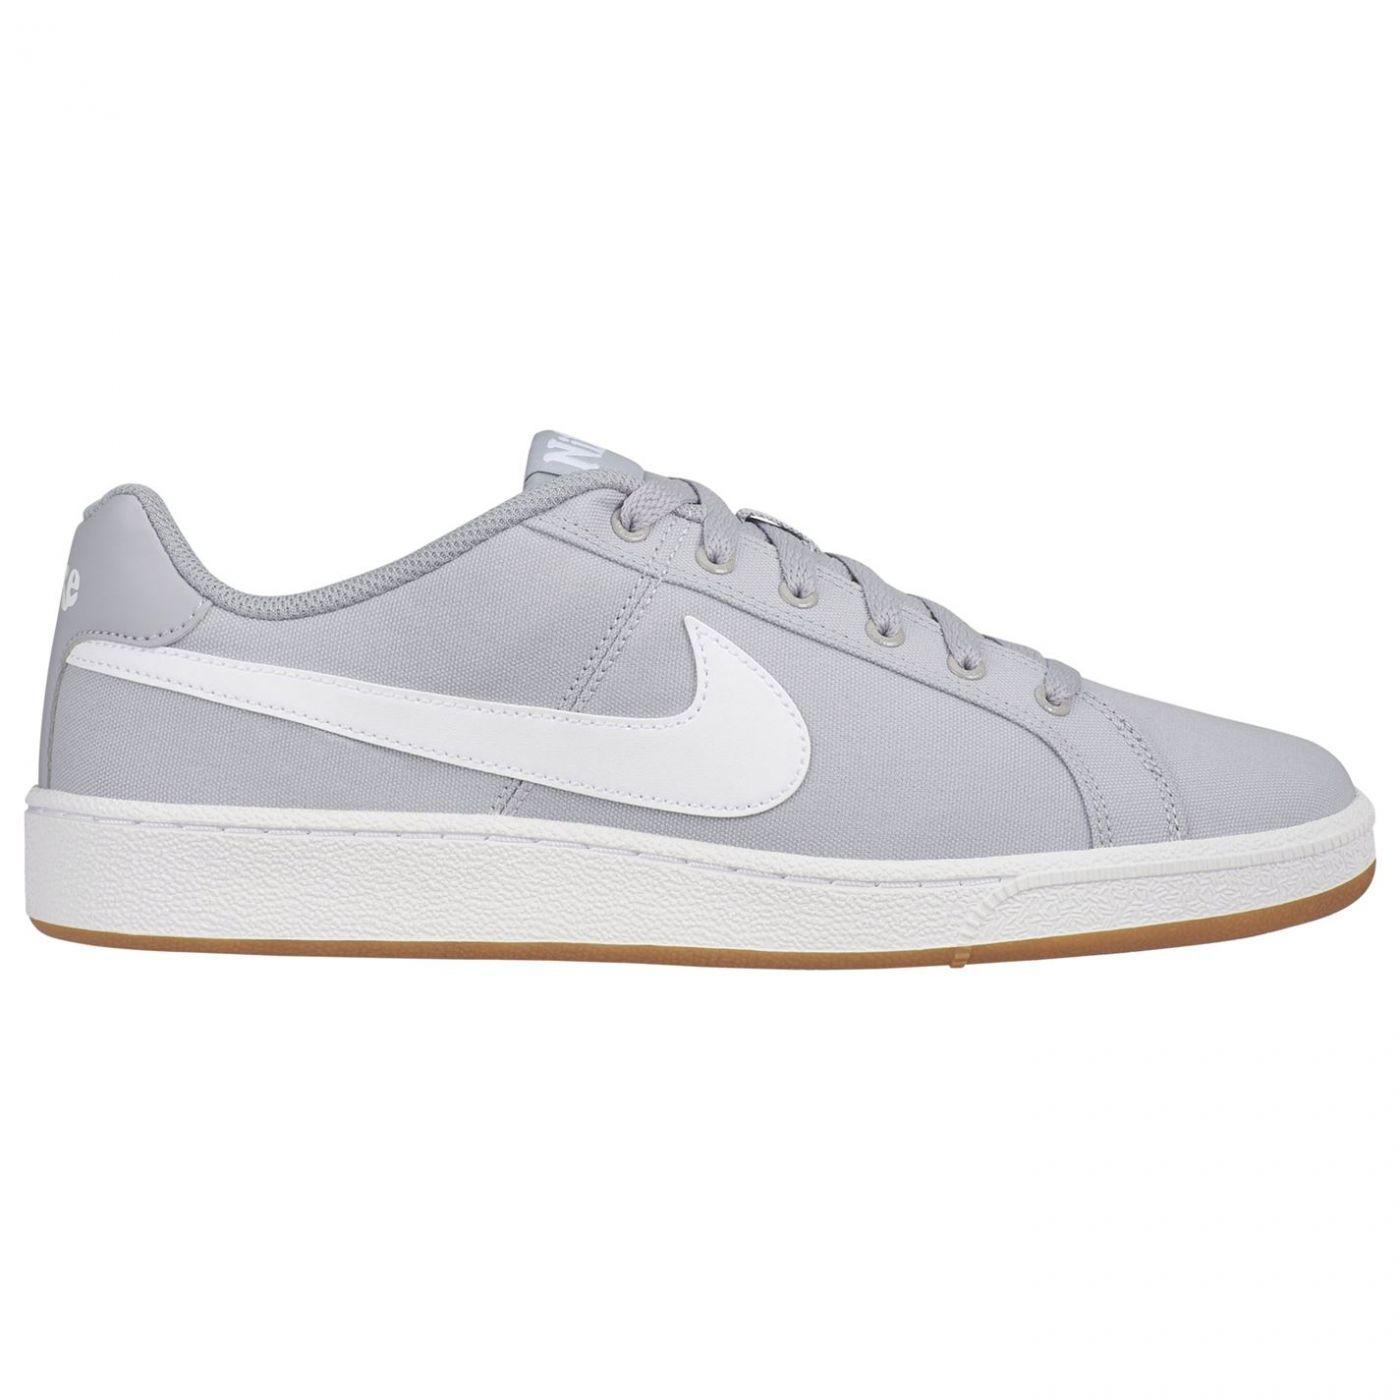 e8ee8526853 Nike Court Royale Cvs S92 - FACTCOOL